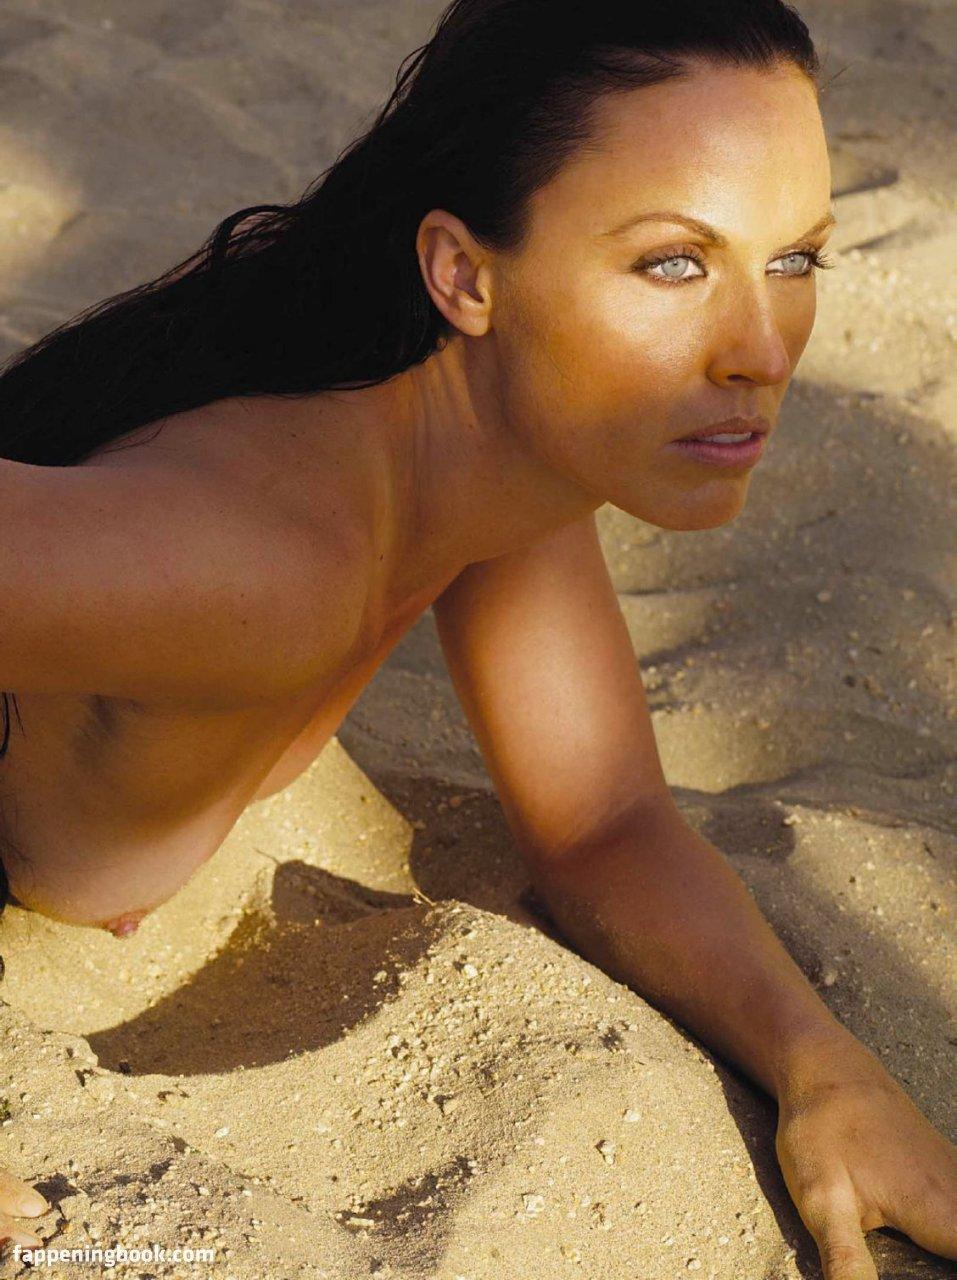 Amanda Beard Playboy Pics amanda beard nude, sexy, the fappening, uncensored - photo